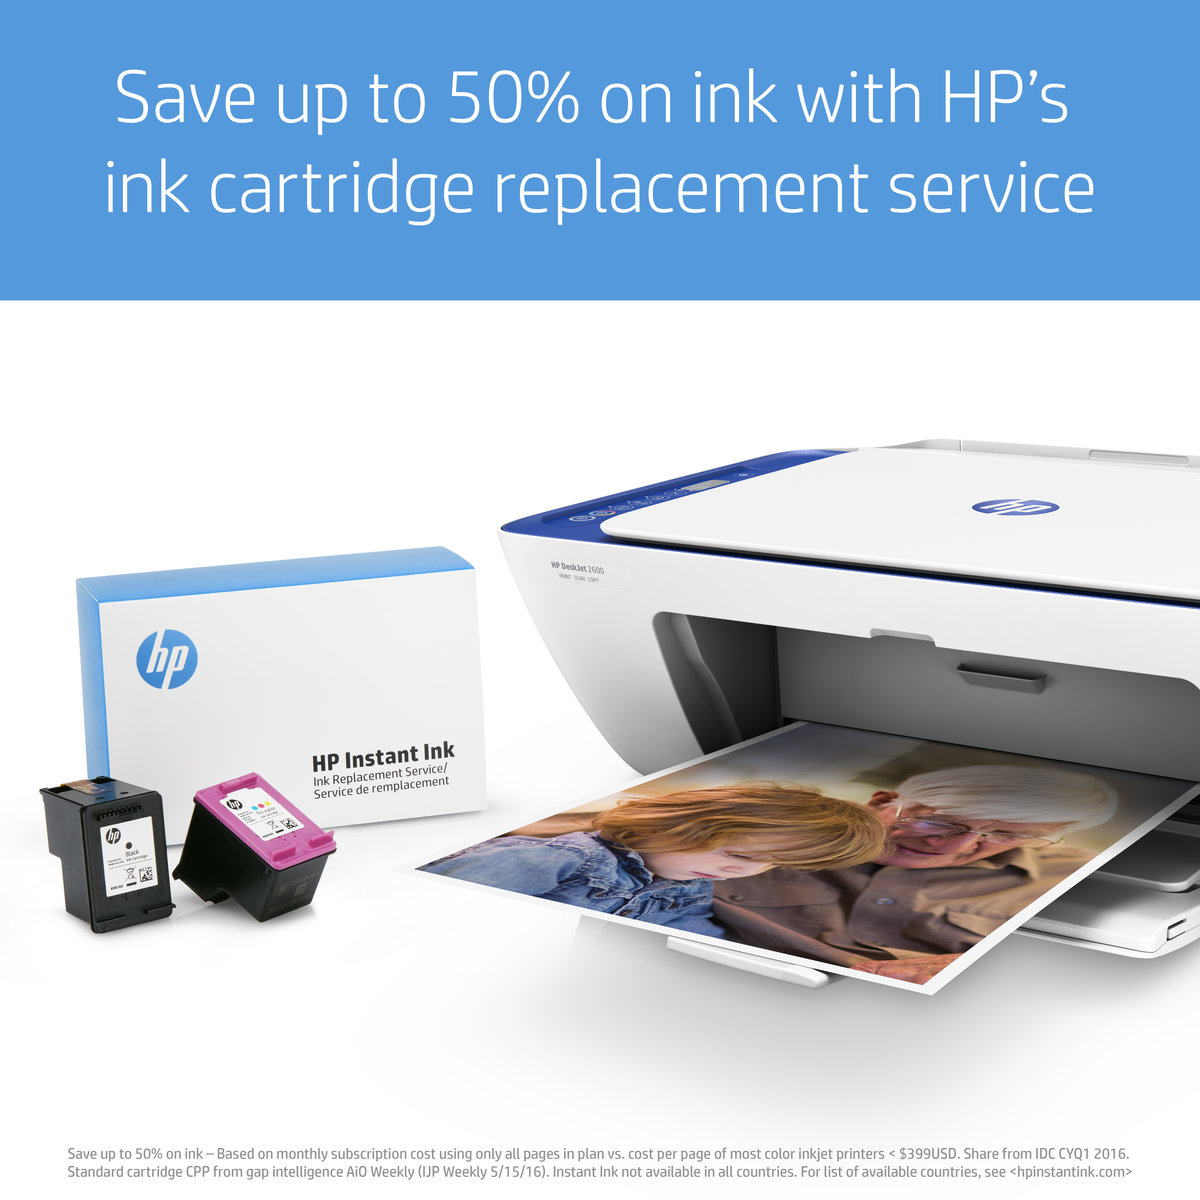 Hp Deskjet 2655 All In One Inkjet Printer V1n04ab1h Just Around The Corner Circuit Boards From 3d Printers Cartridge